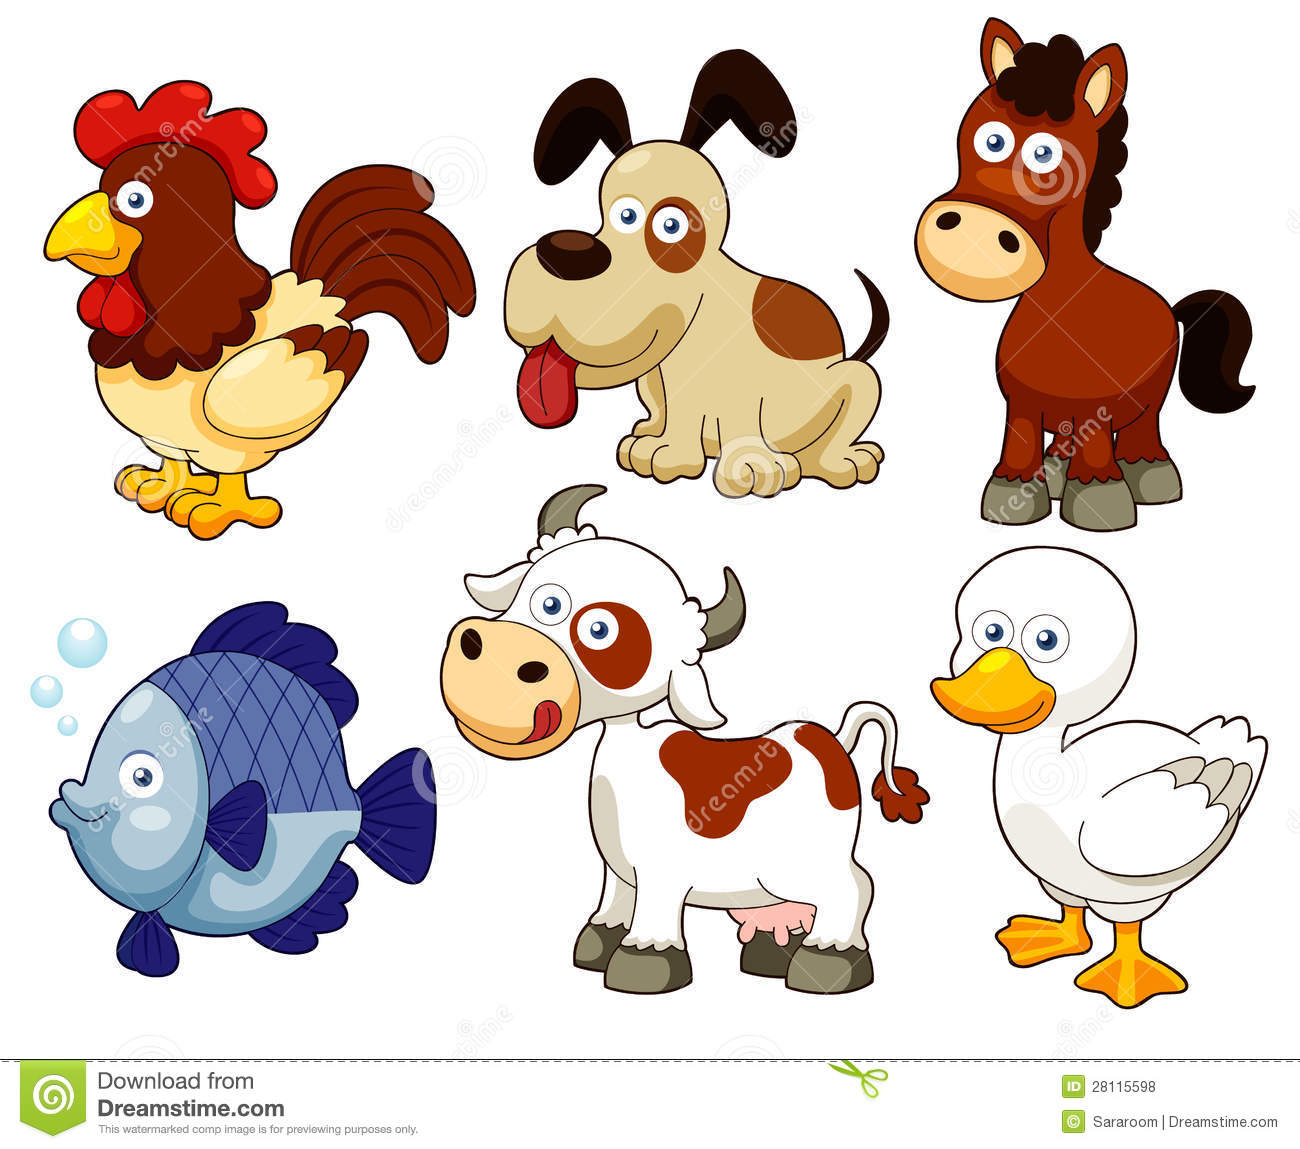 Farm Animals Free Download Clipart-Farm Animals Free Download Clipart-13